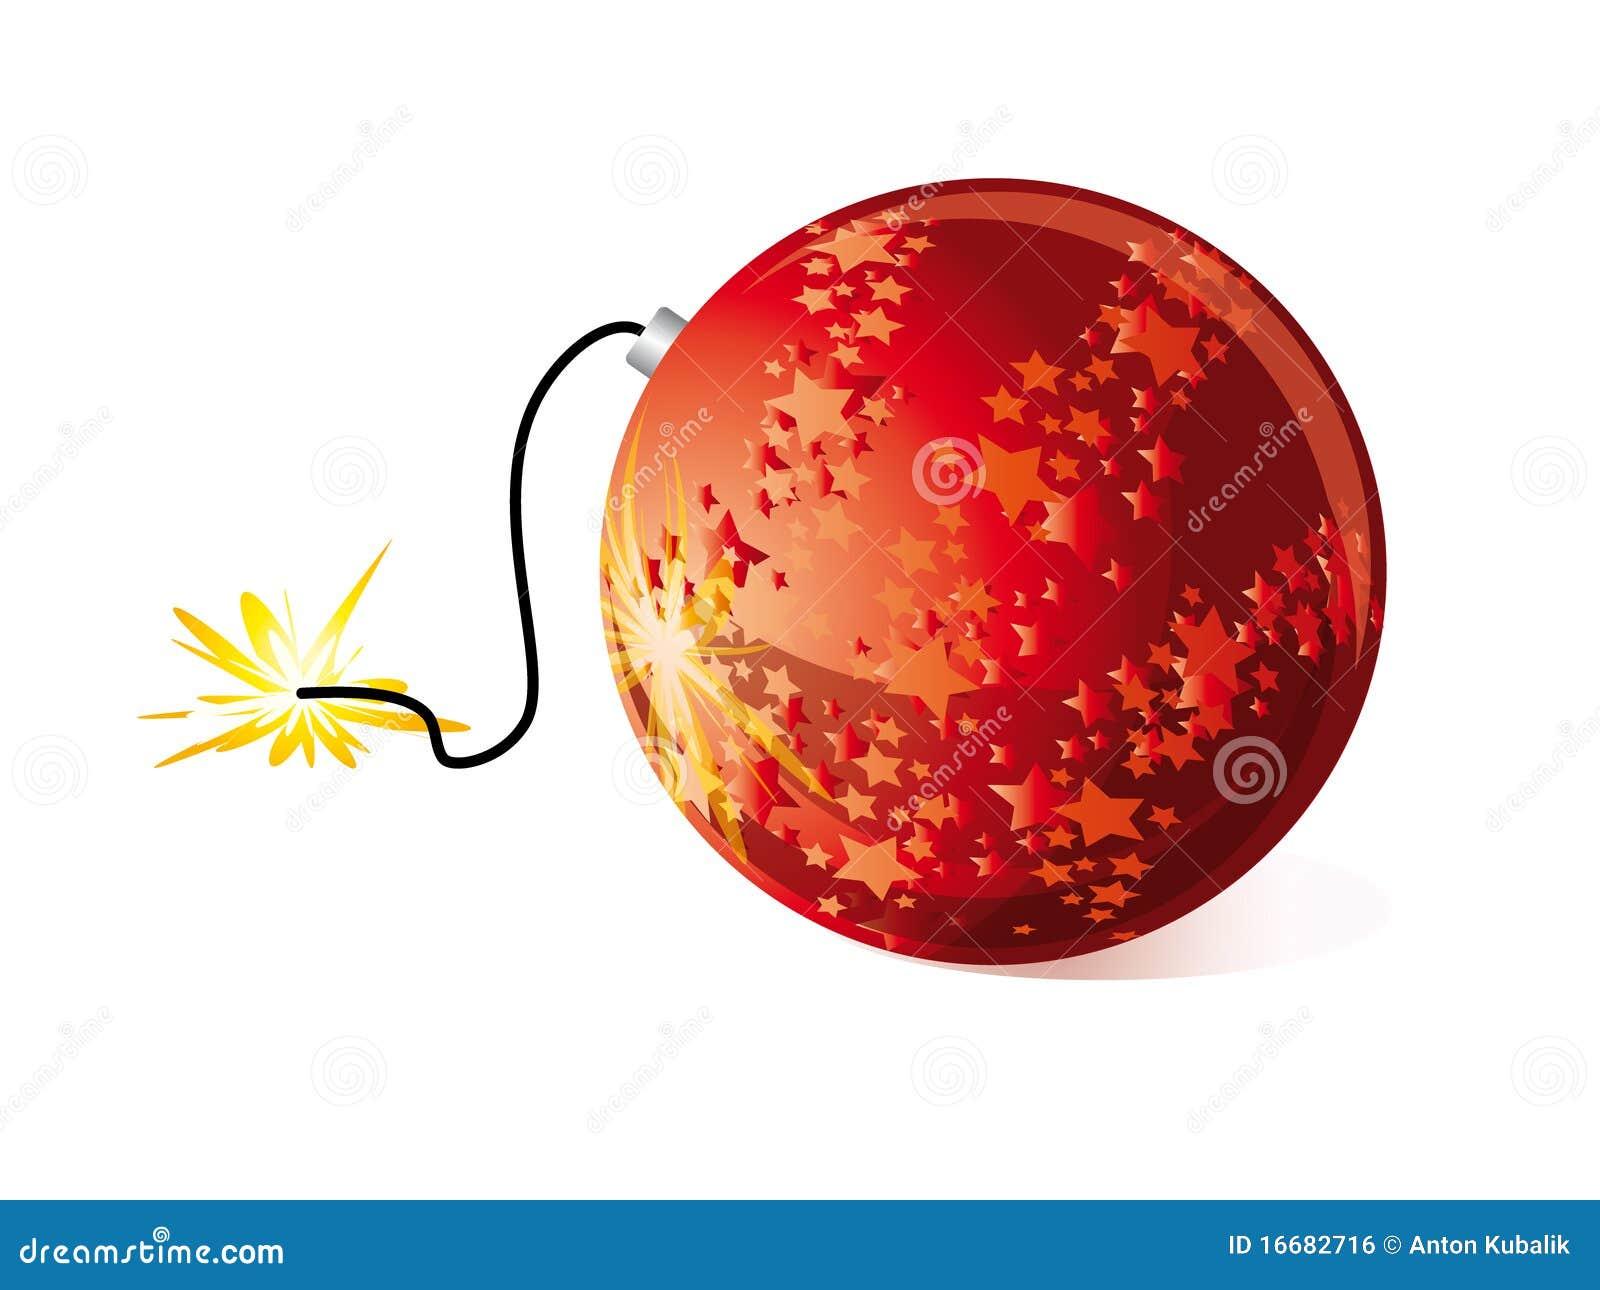 Christmas bomb stock vector. Illustration of bomb, vector - 16682716